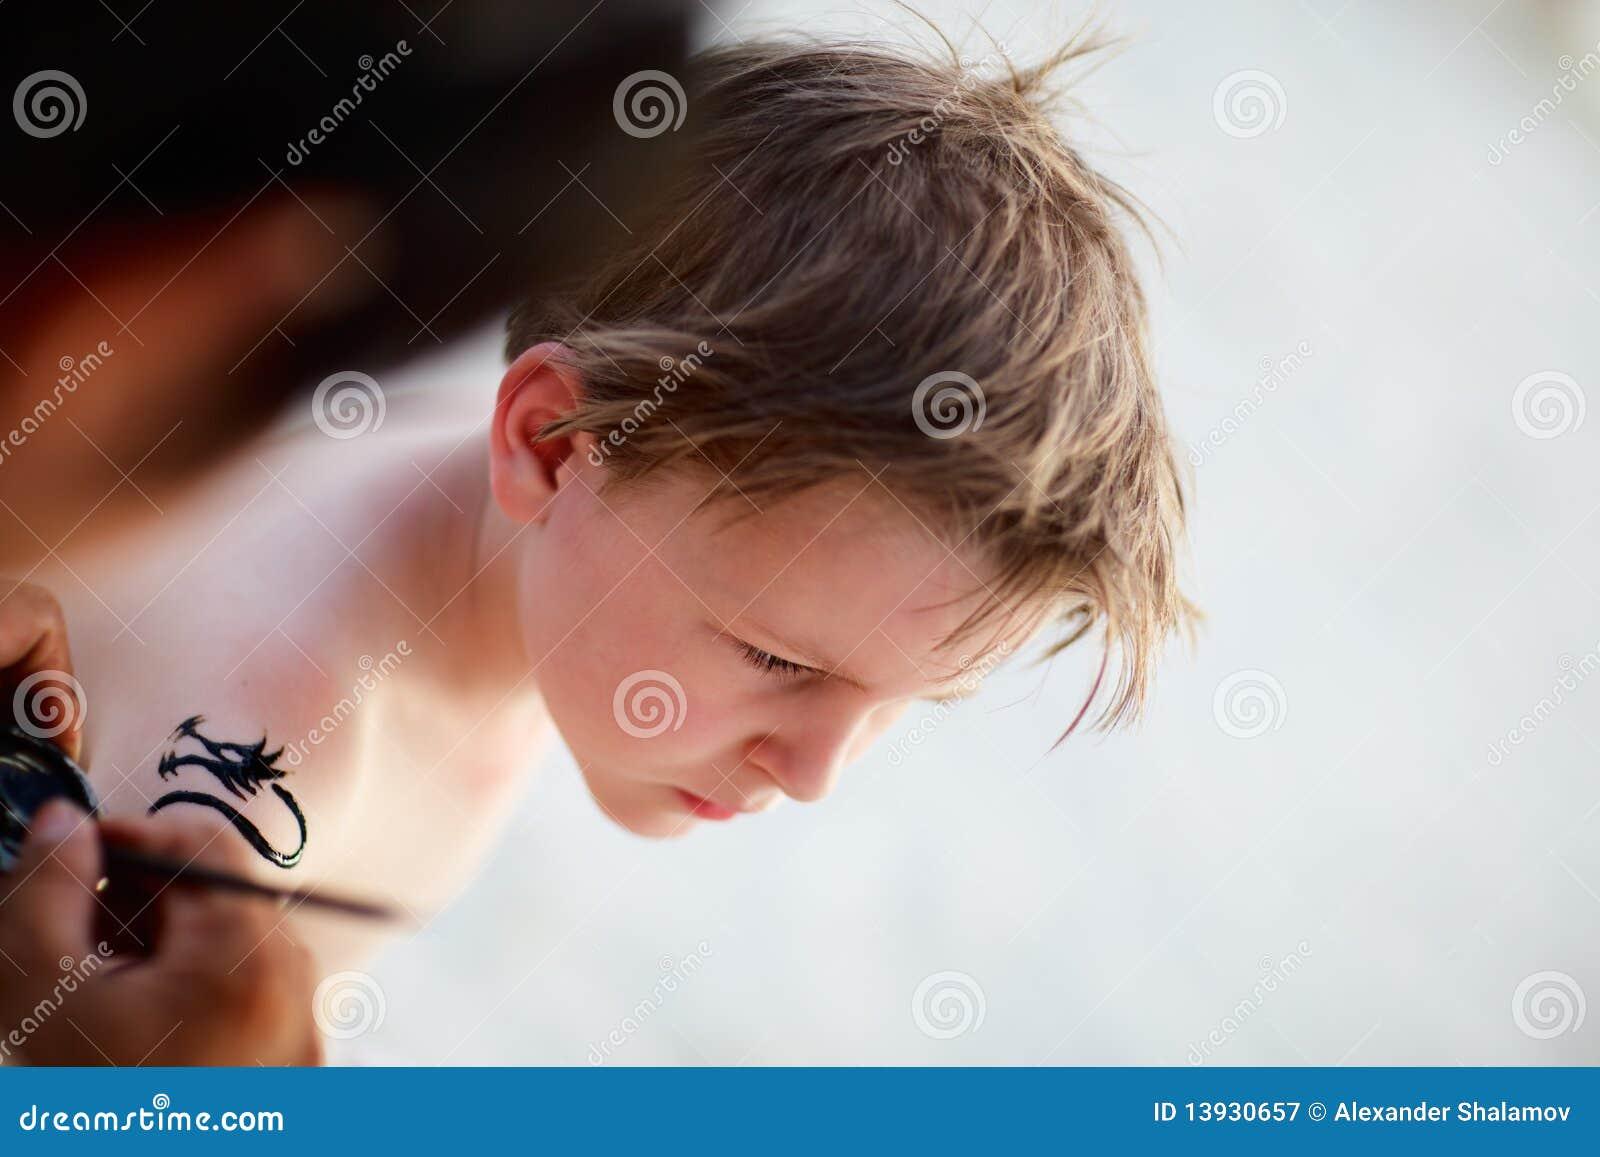 Boy Having Henna Tattoo Stock Image Image Of Henna Vacation 13930657